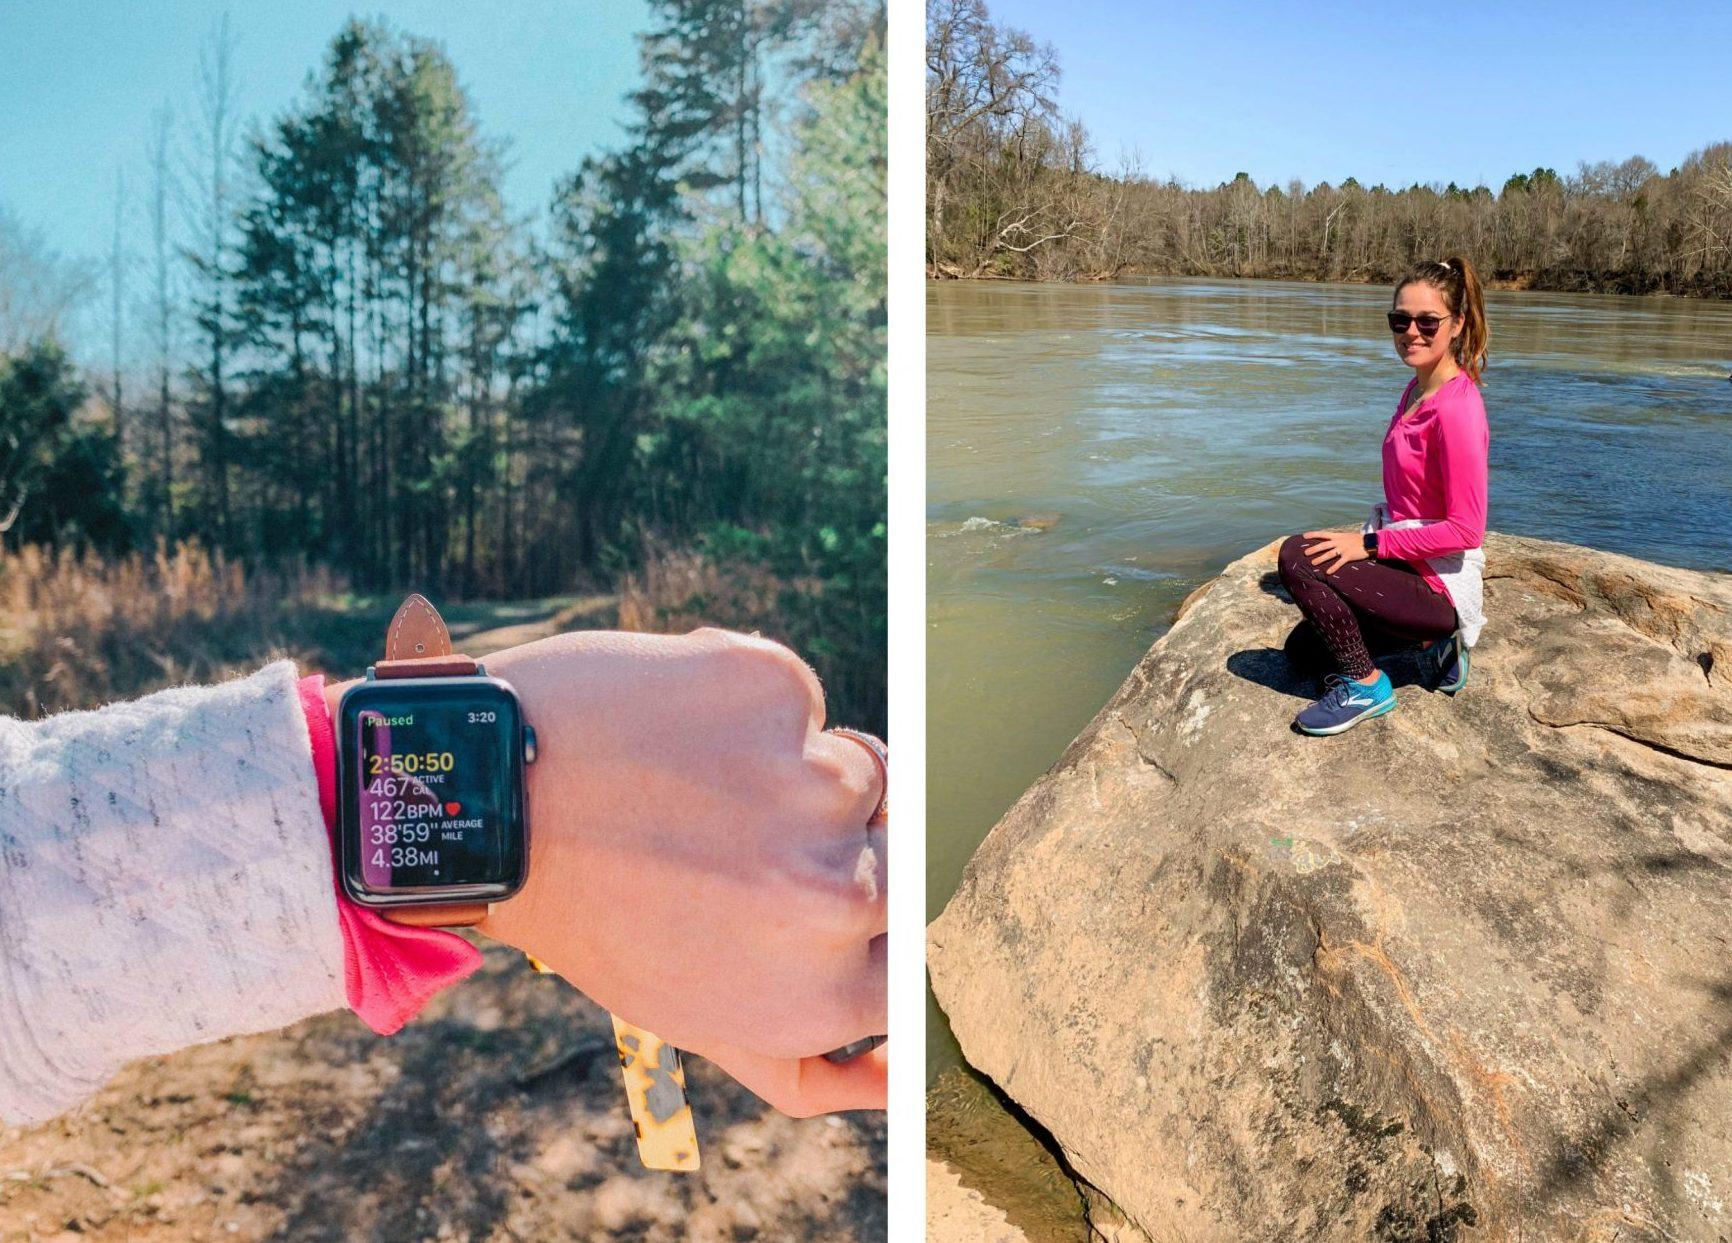 trail walking, masons trail, masons bend, trail morning, fitness, walking, South Carolina